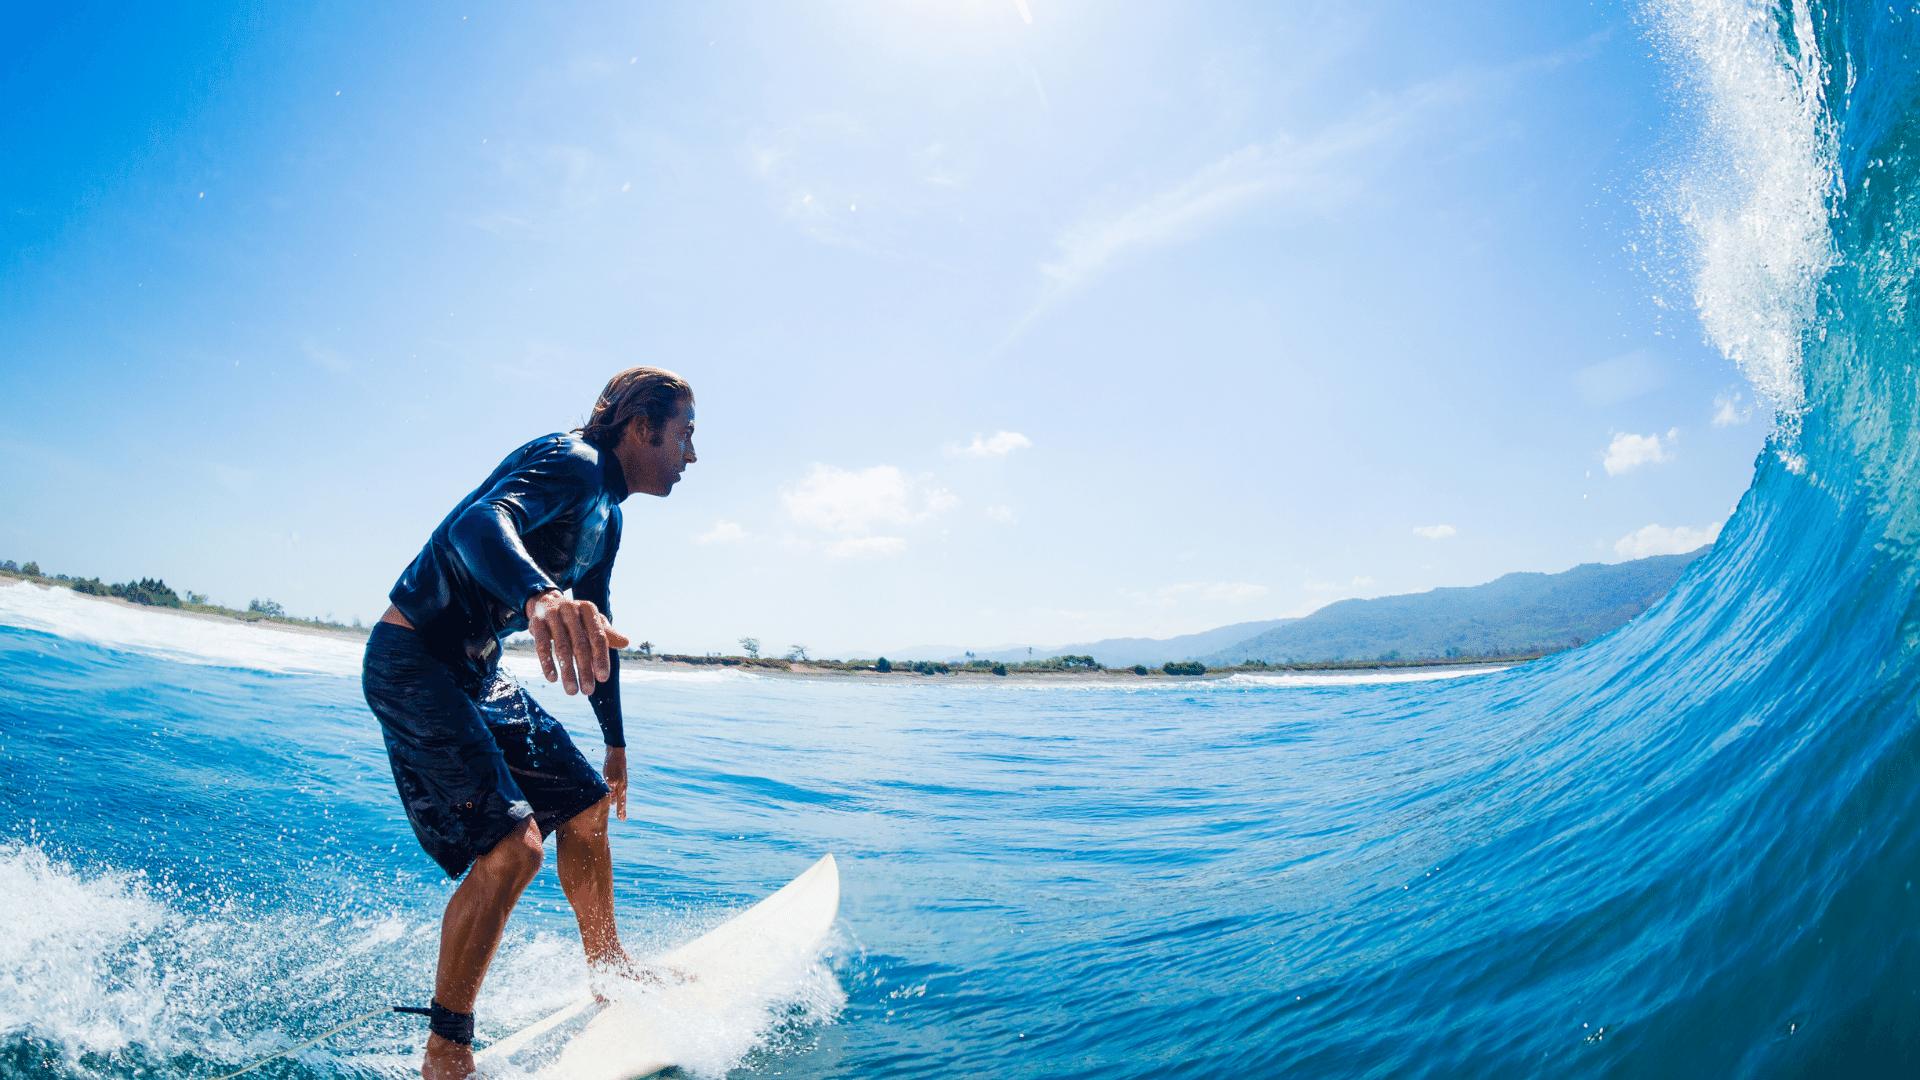 Cutback Surfmanöver